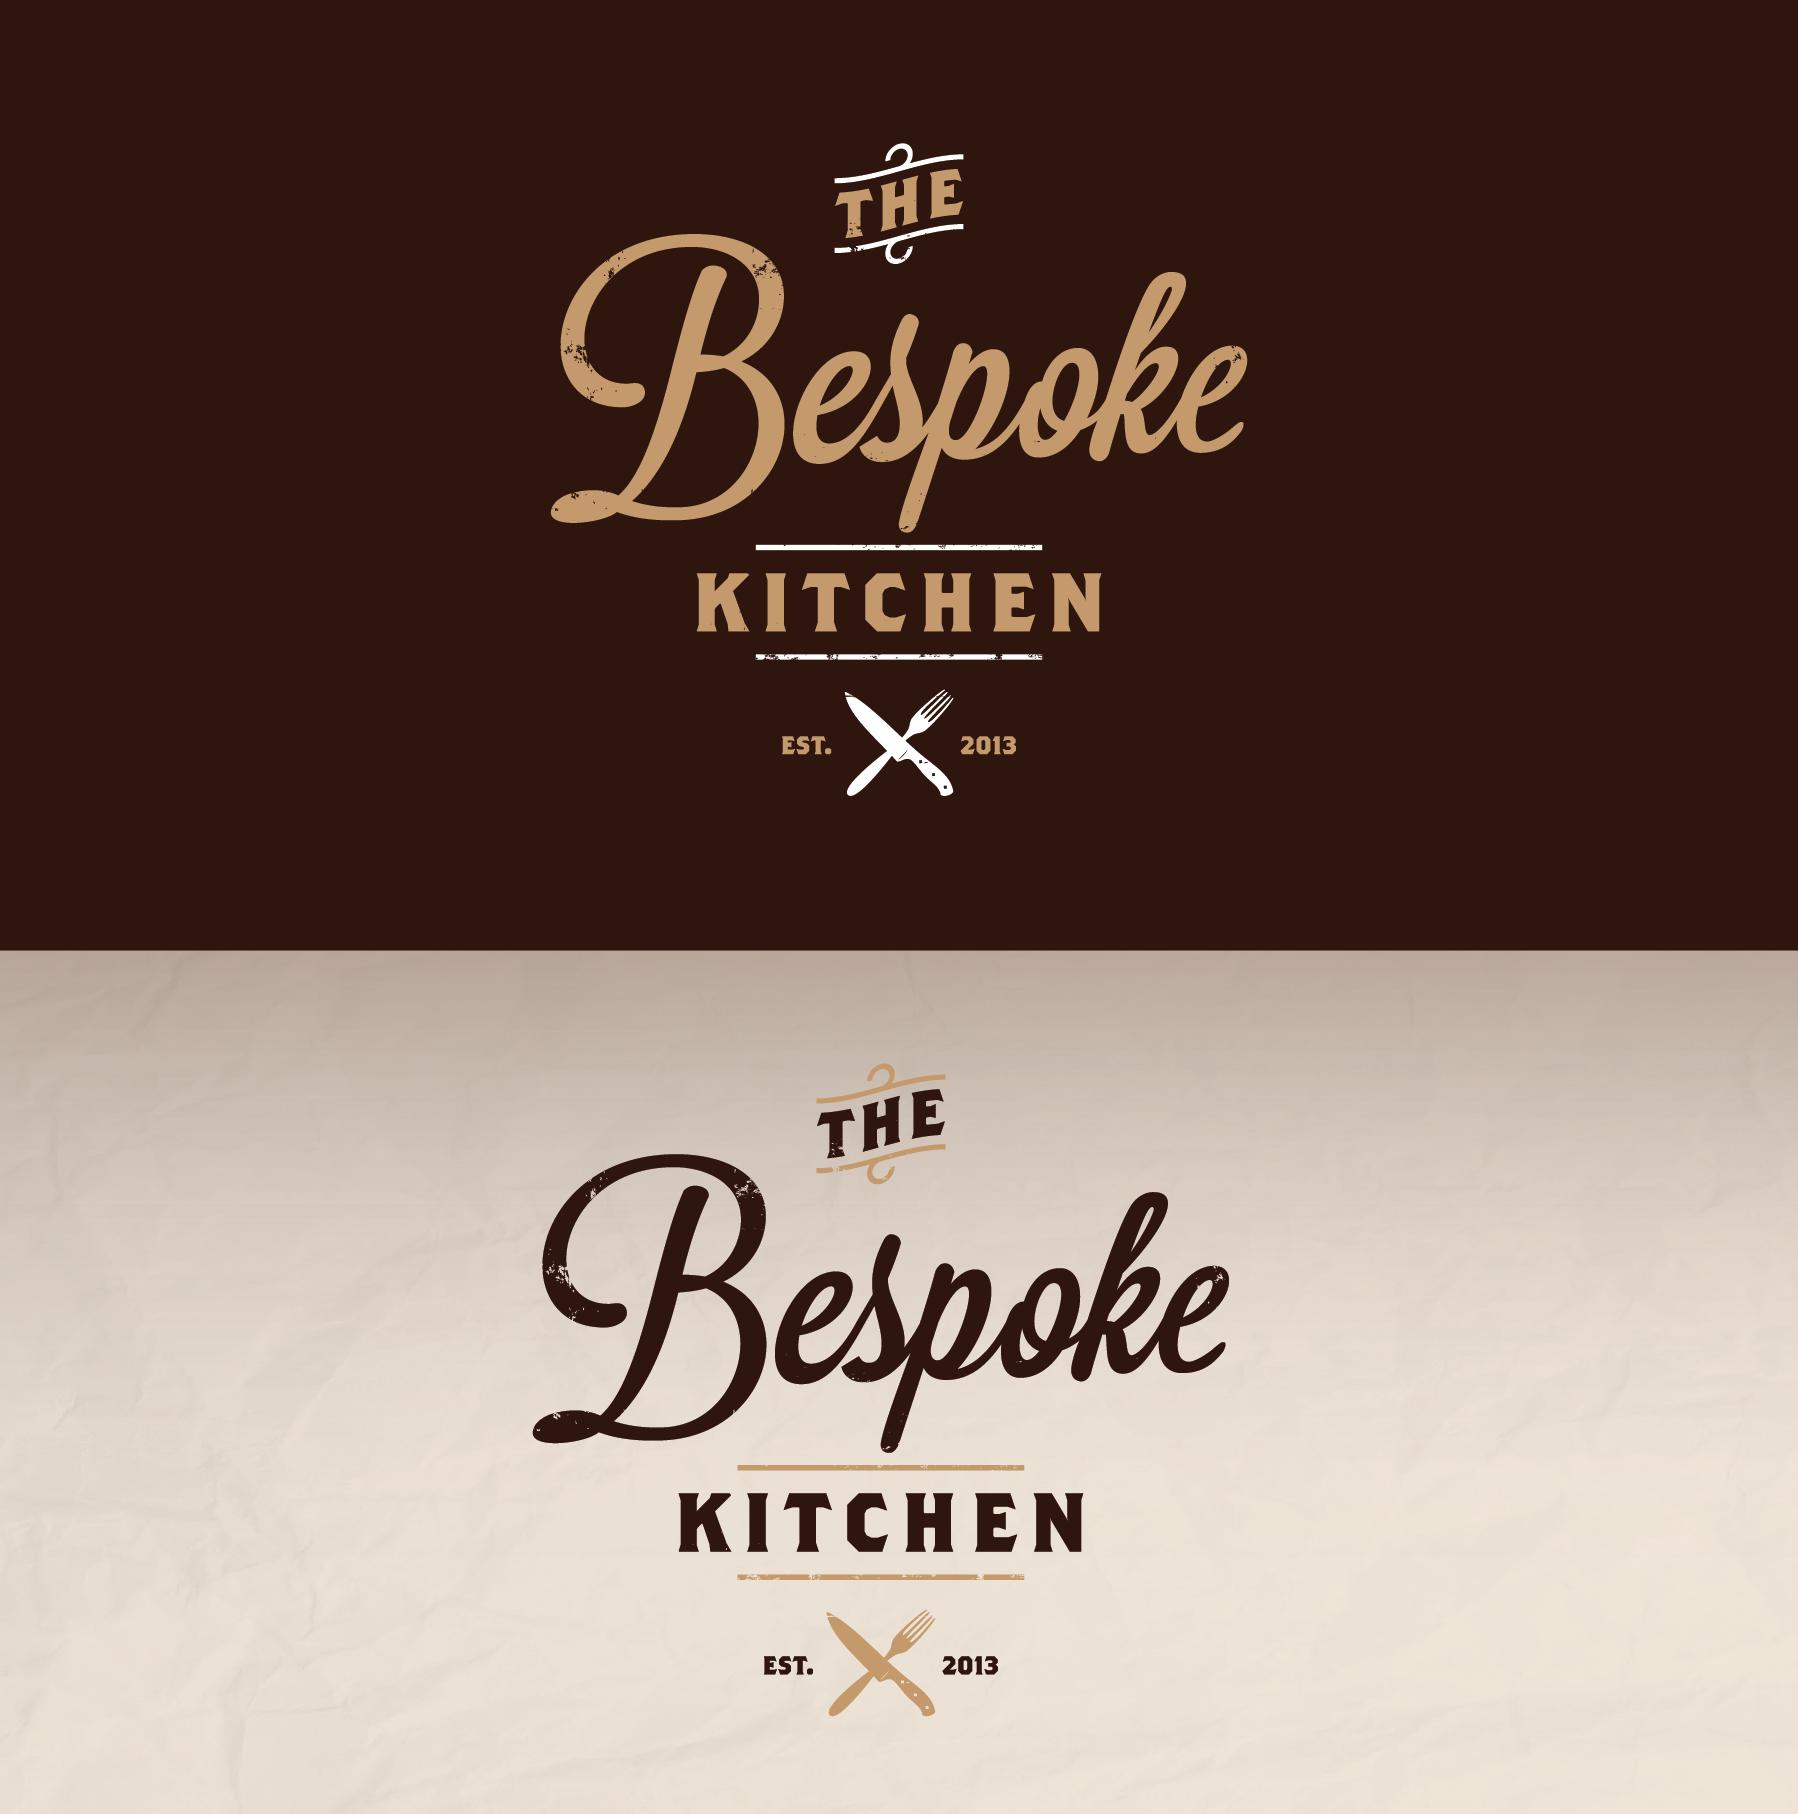 Kitchen Designer Logo Vintage Logo Design For The Bespoke Kitchenmuszaj  Vintage